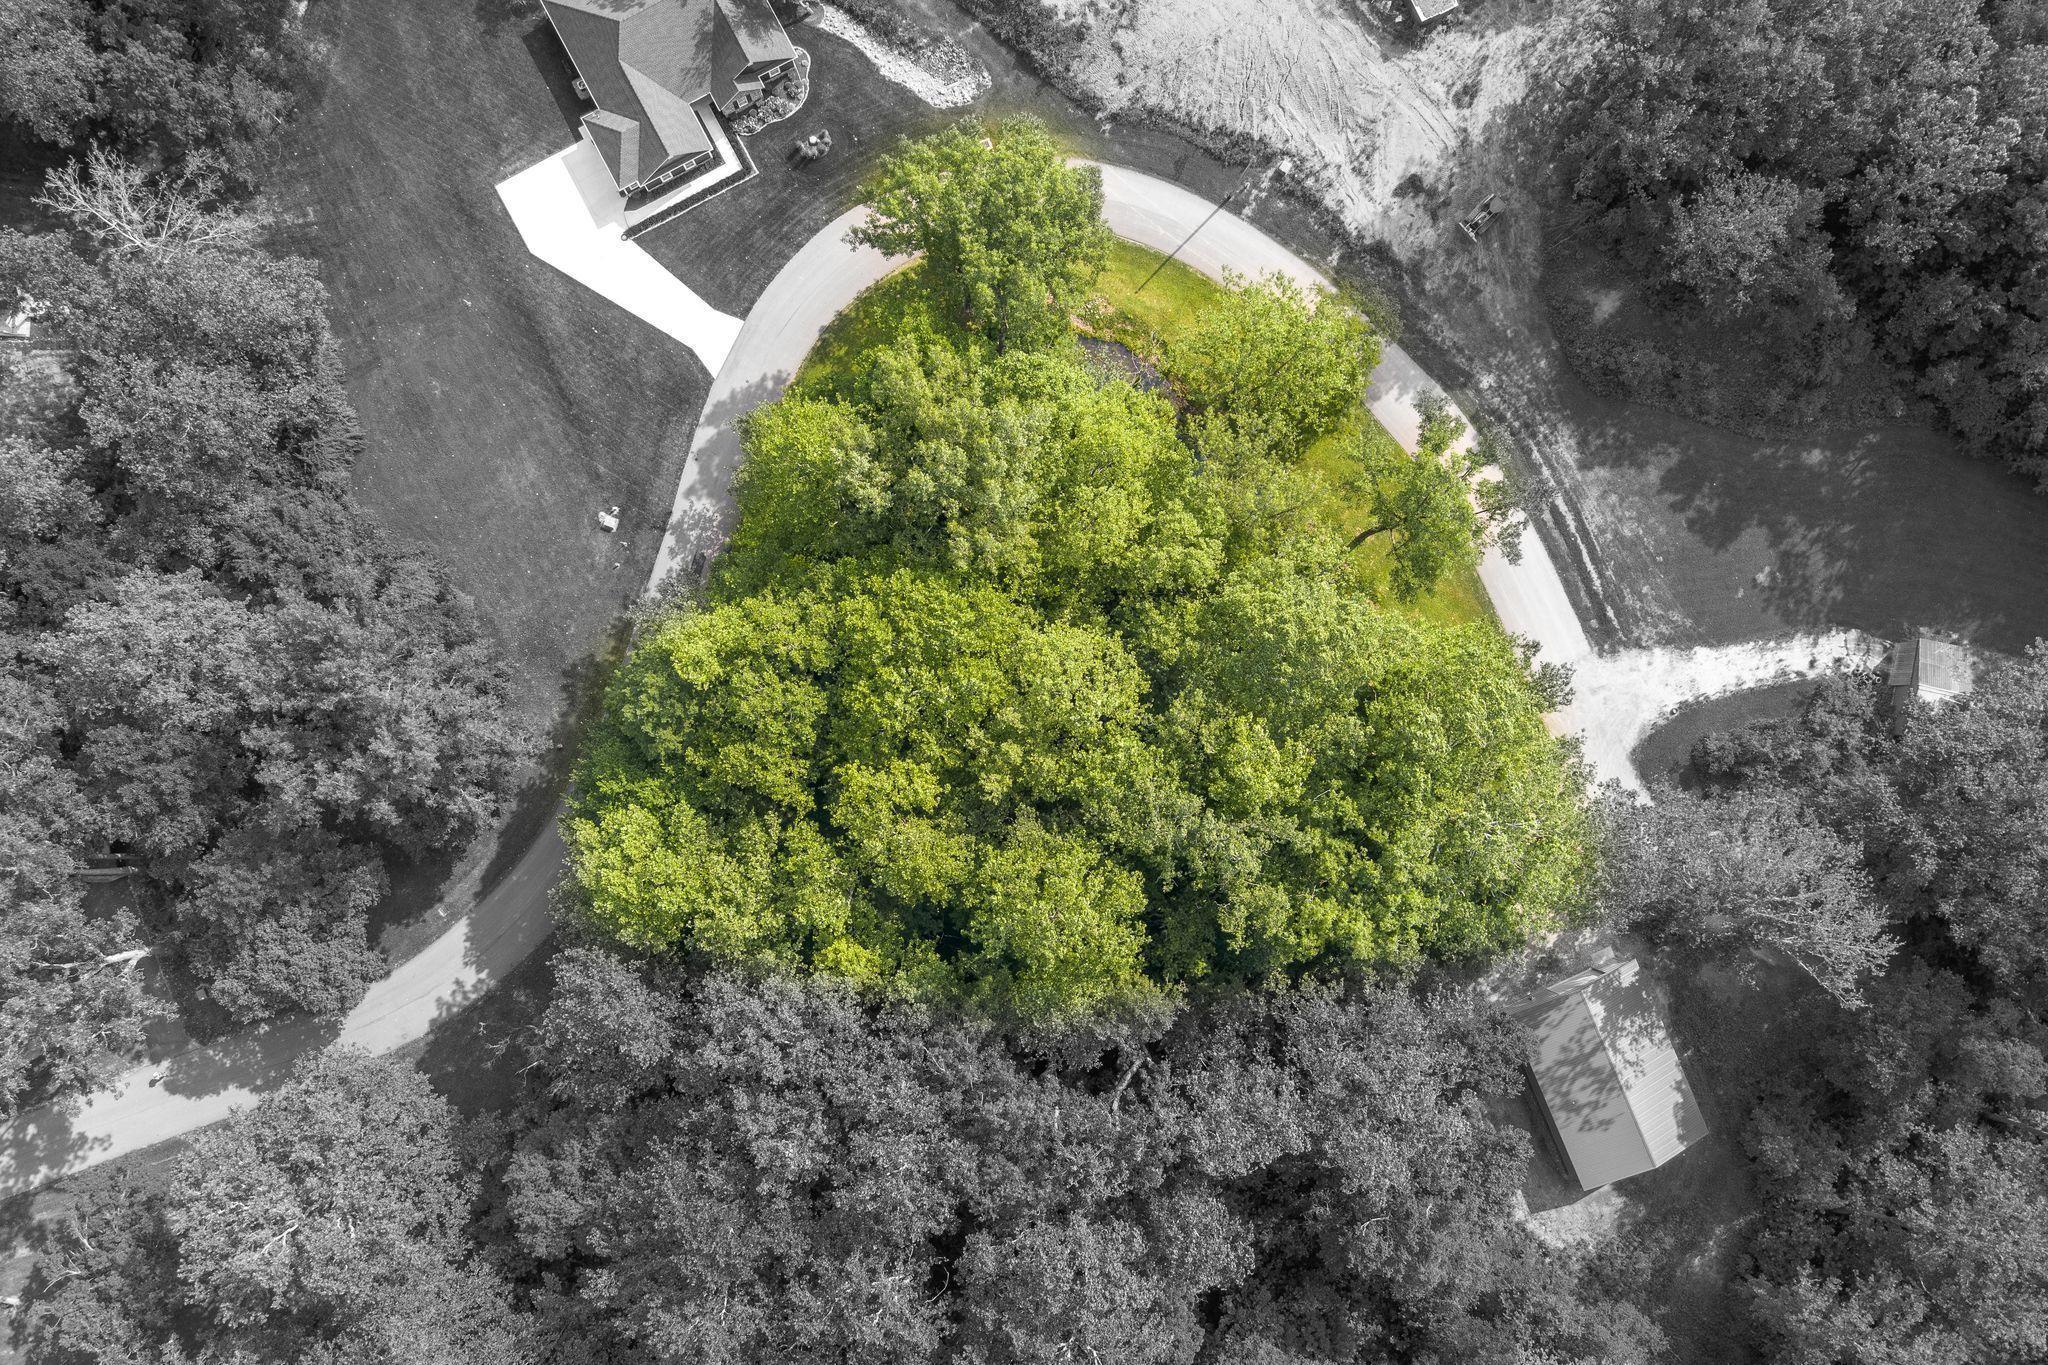 Lot 128 - Chester estates - pic 1